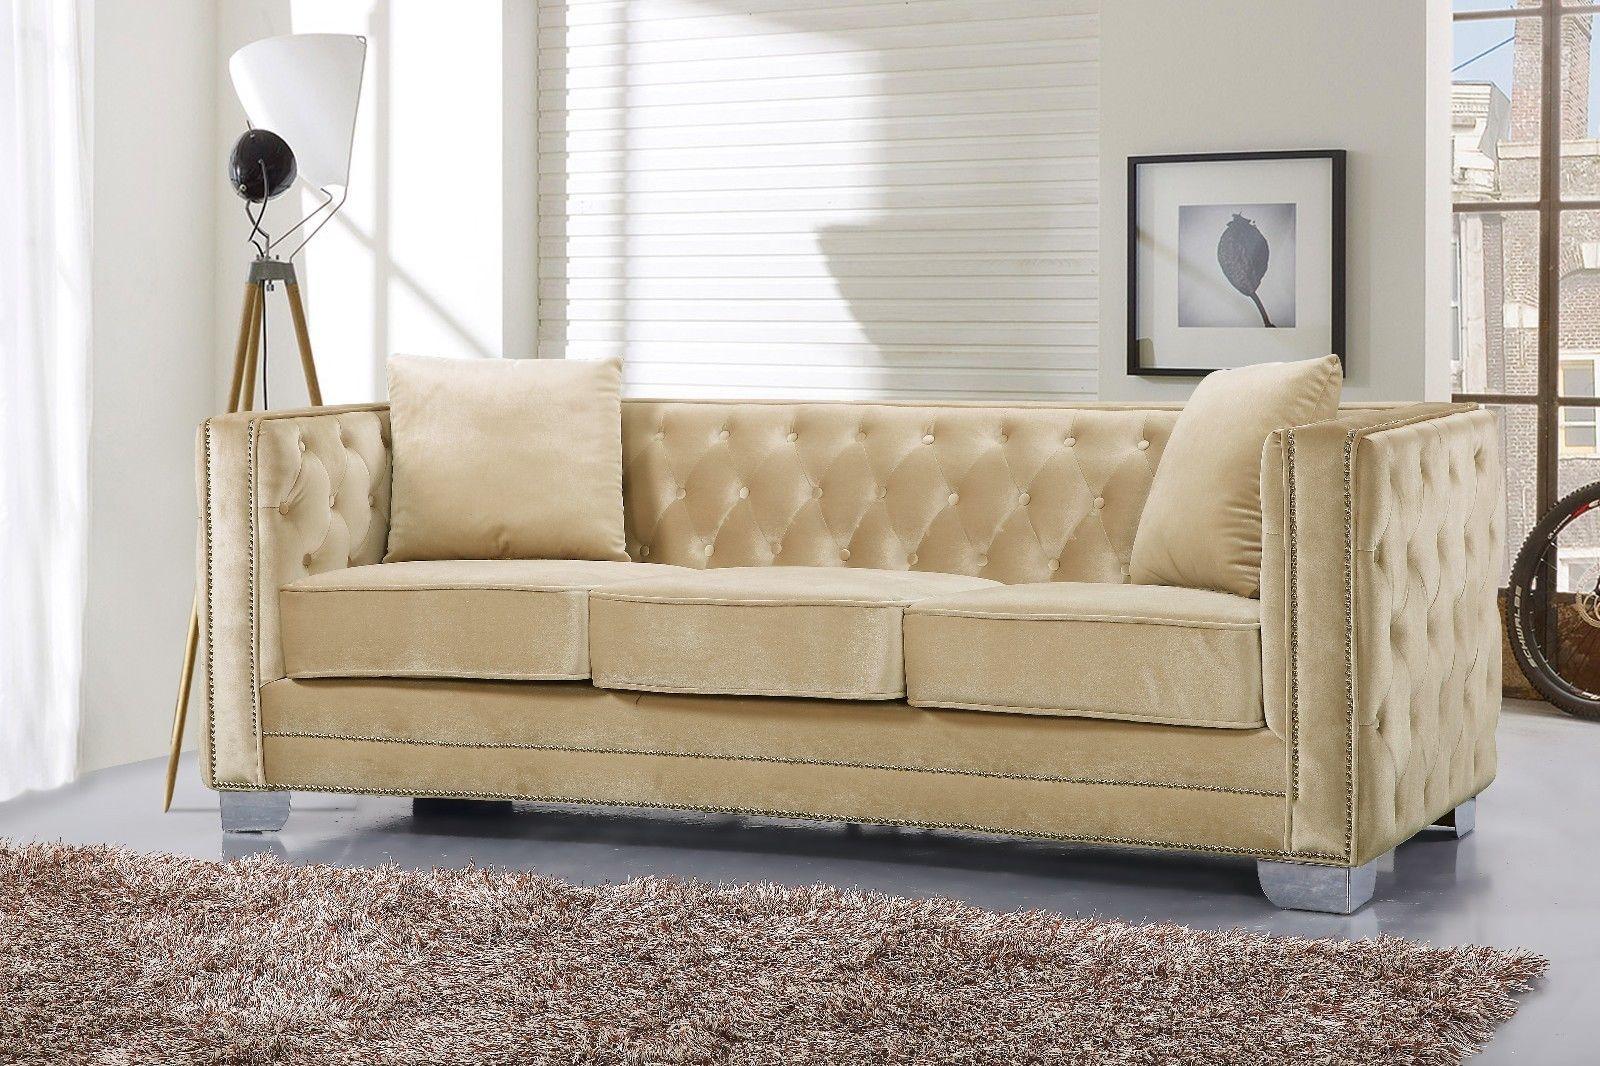 Meridian 648 Velvet Living Room Sofa Set 3pc. Tufted Beige Contemporary Style